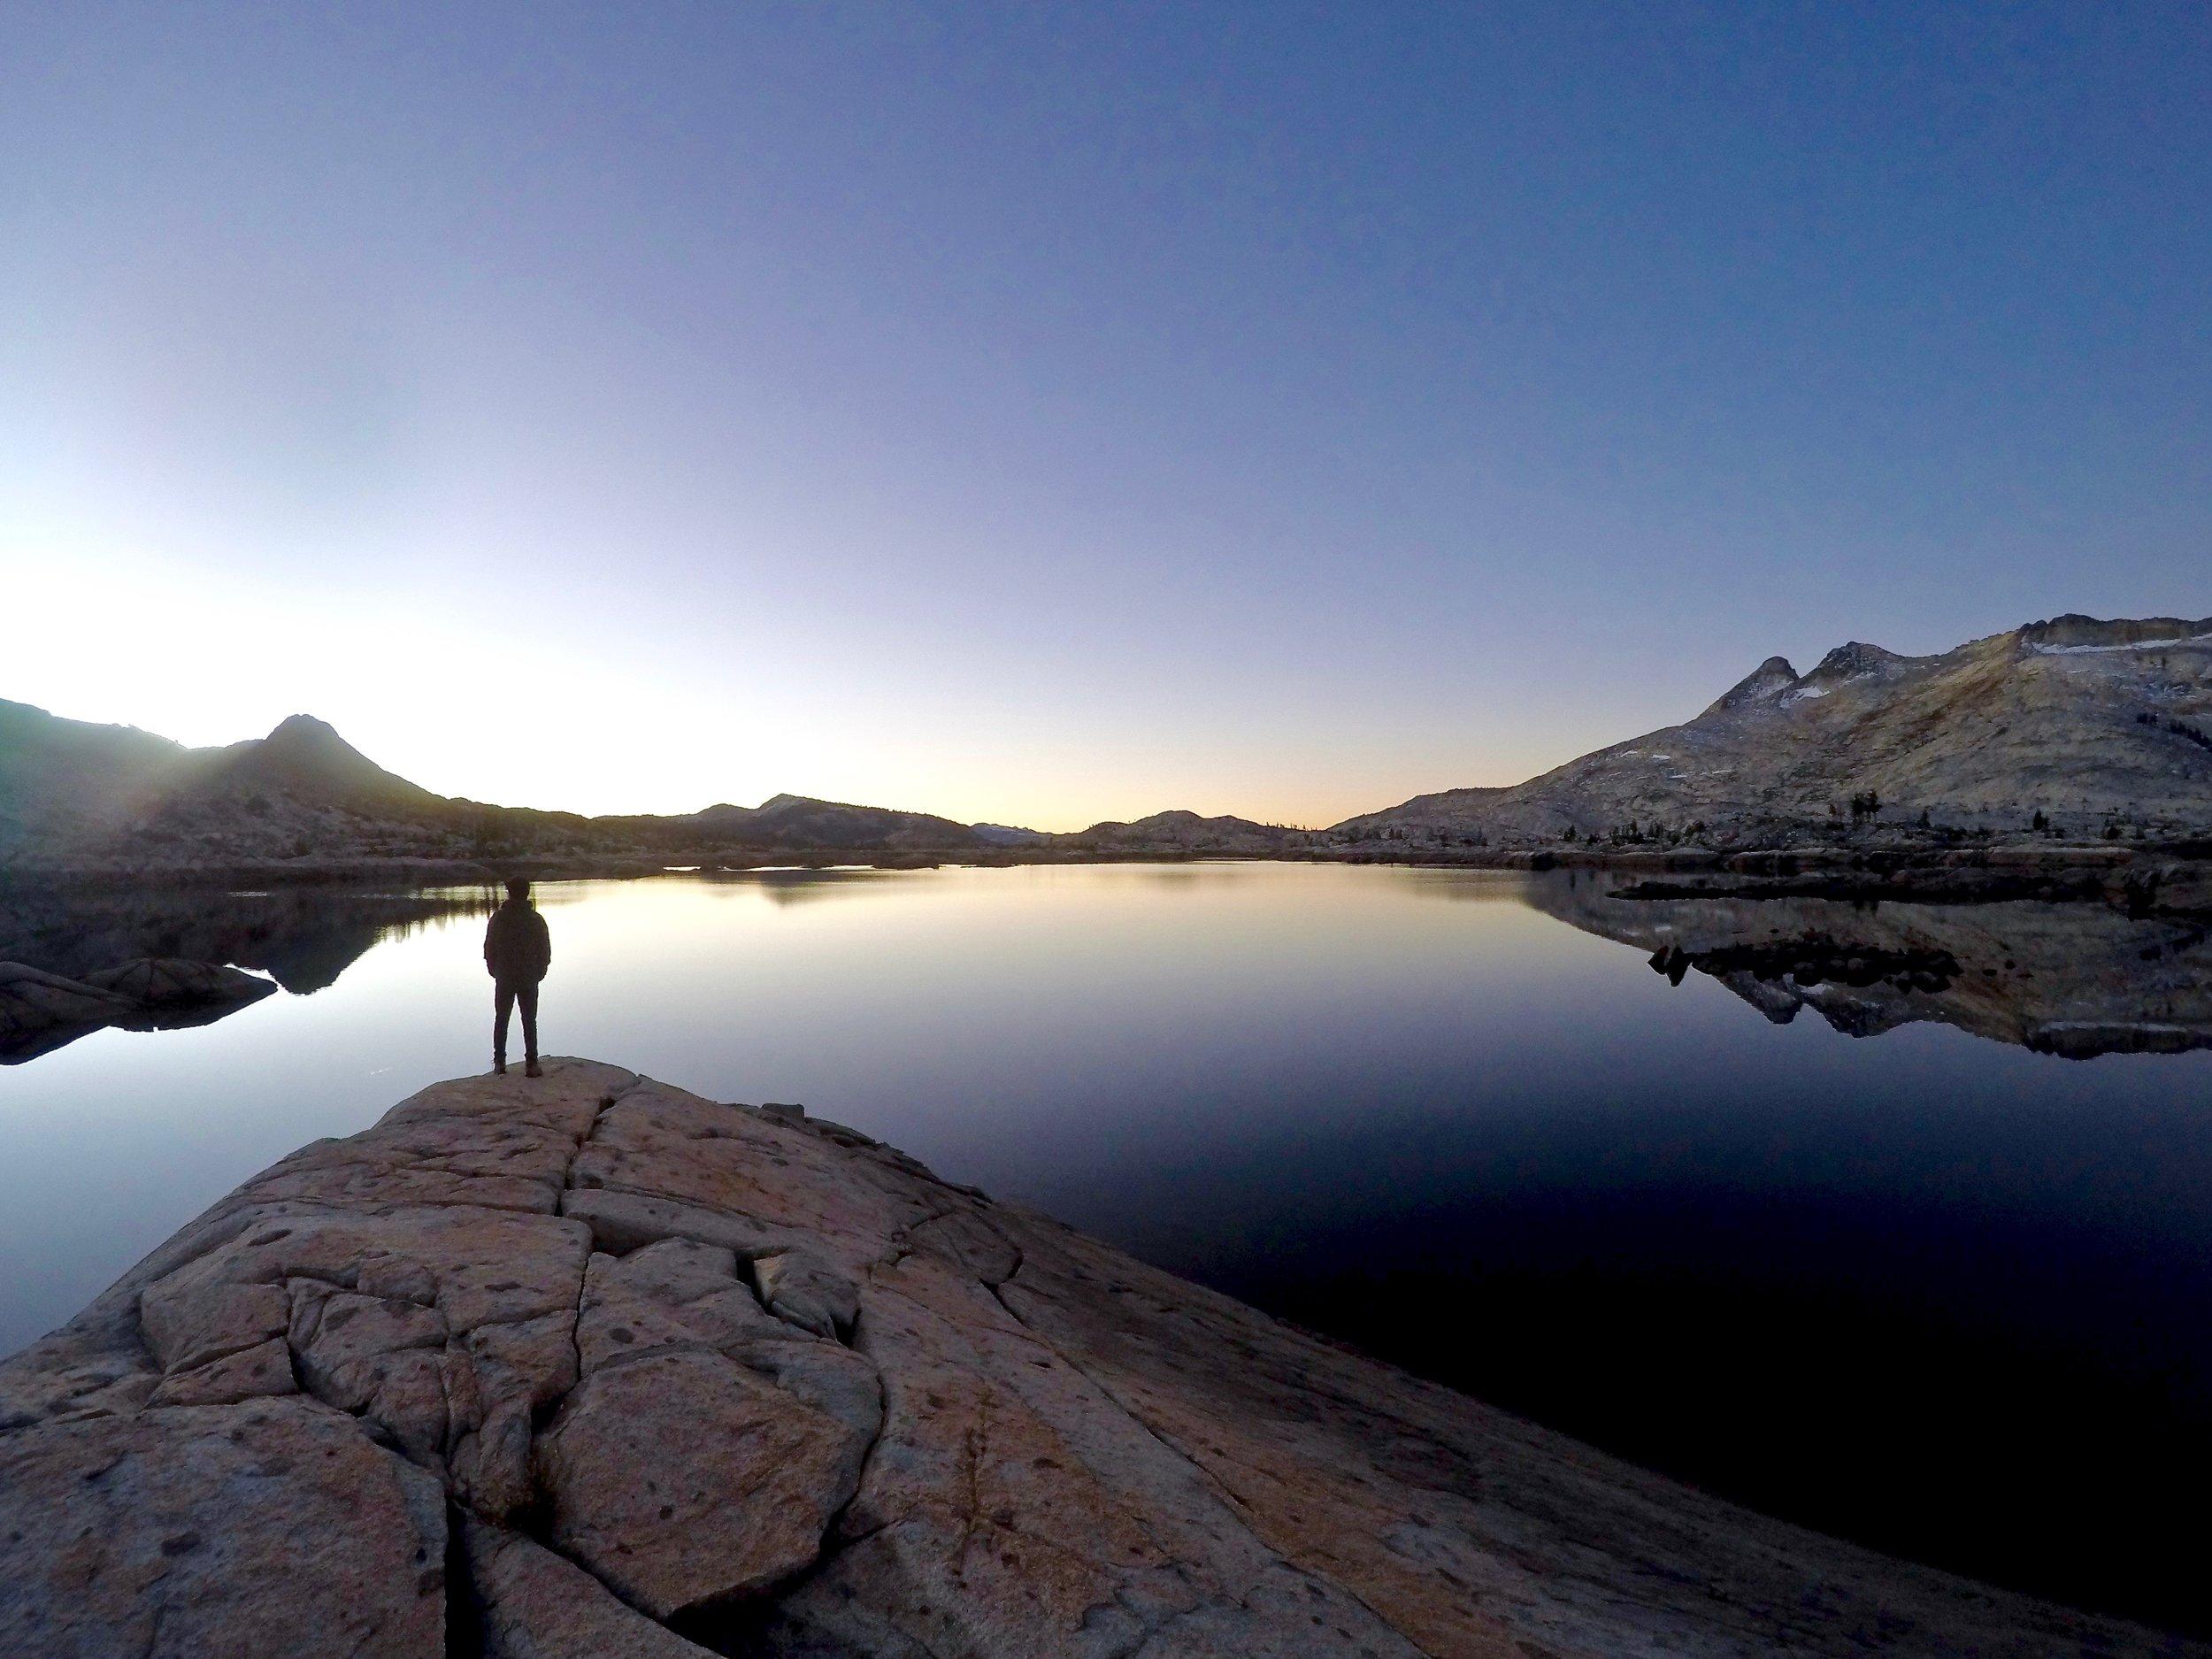 desolation-wilderness-backpacking-trip-report-october